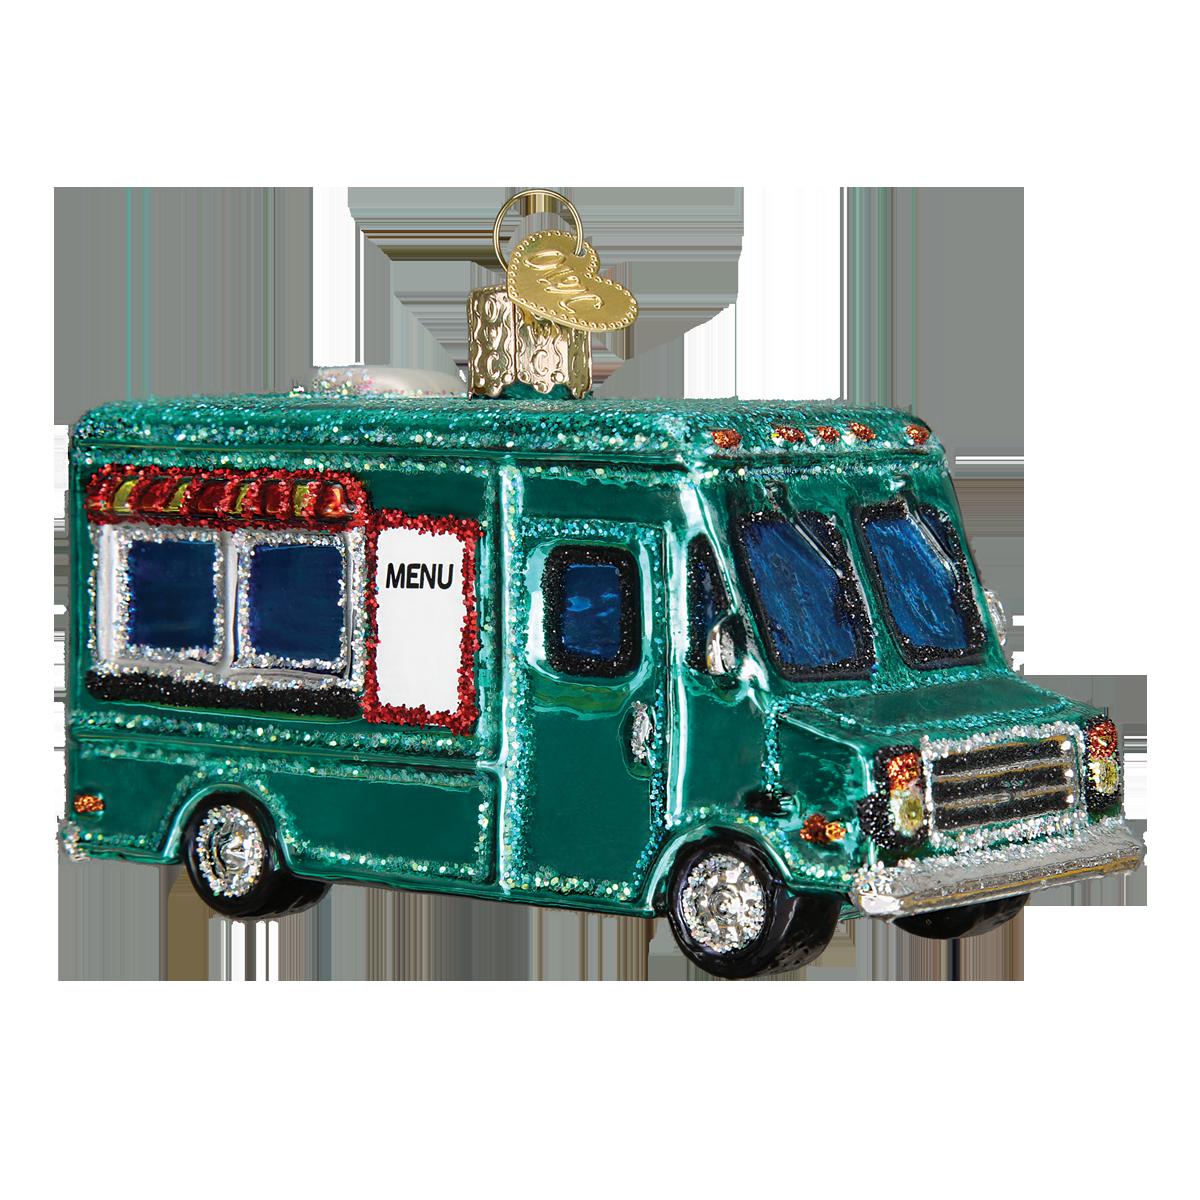 Food Truck #46060 BEST SELLER 2016! #transportation #bestseller #oldworldchristmas #ornaments #glass #foodtruck #new #OWC2016line #foodies